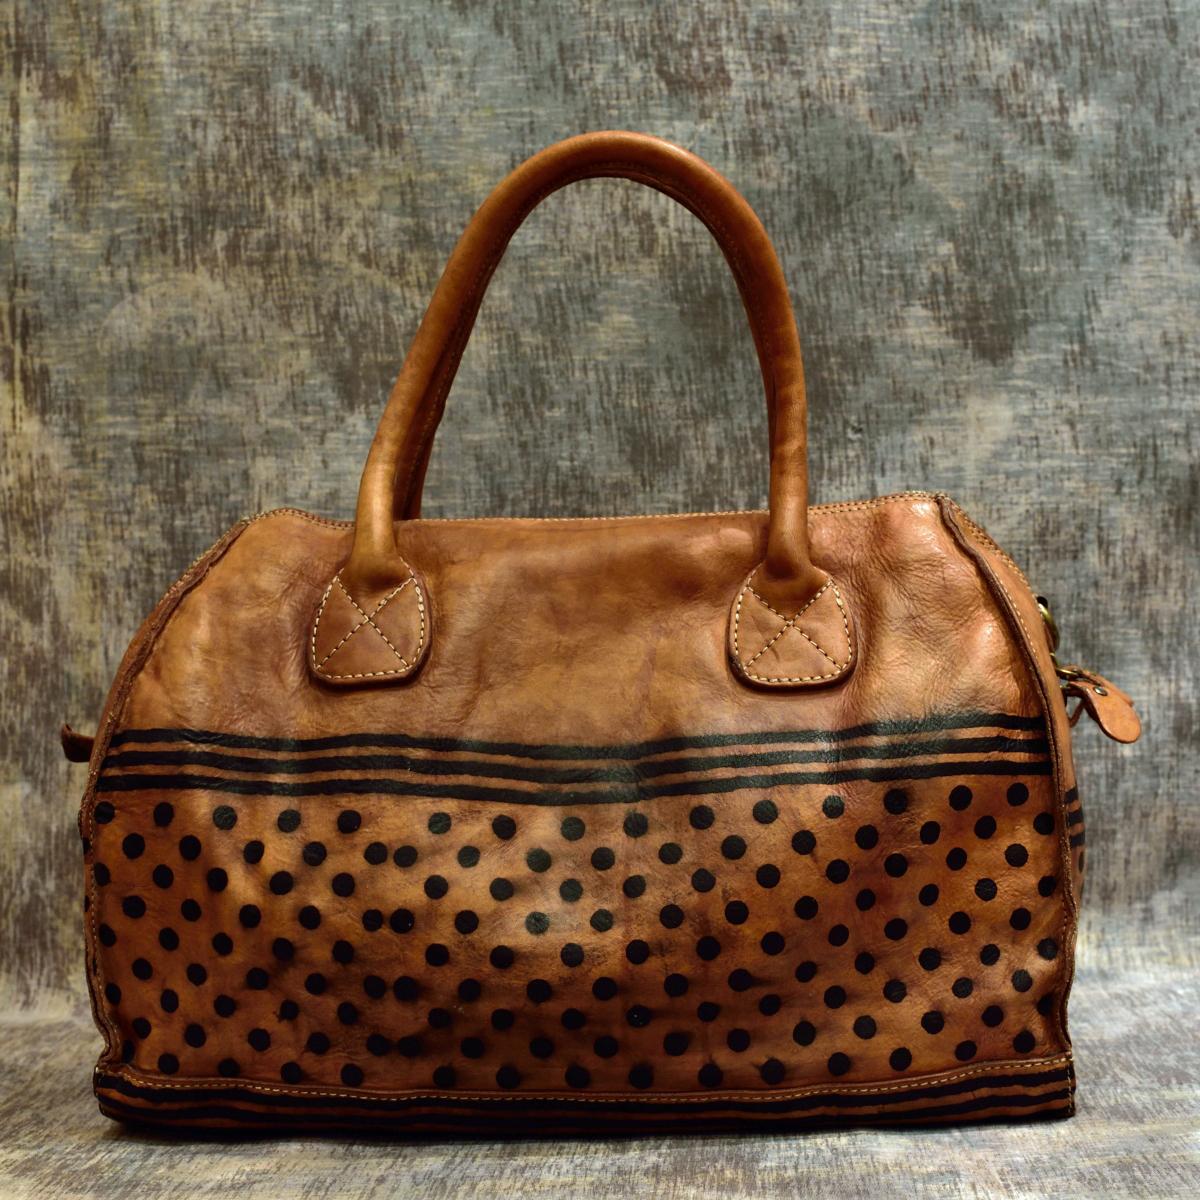 leather handbags polka dots